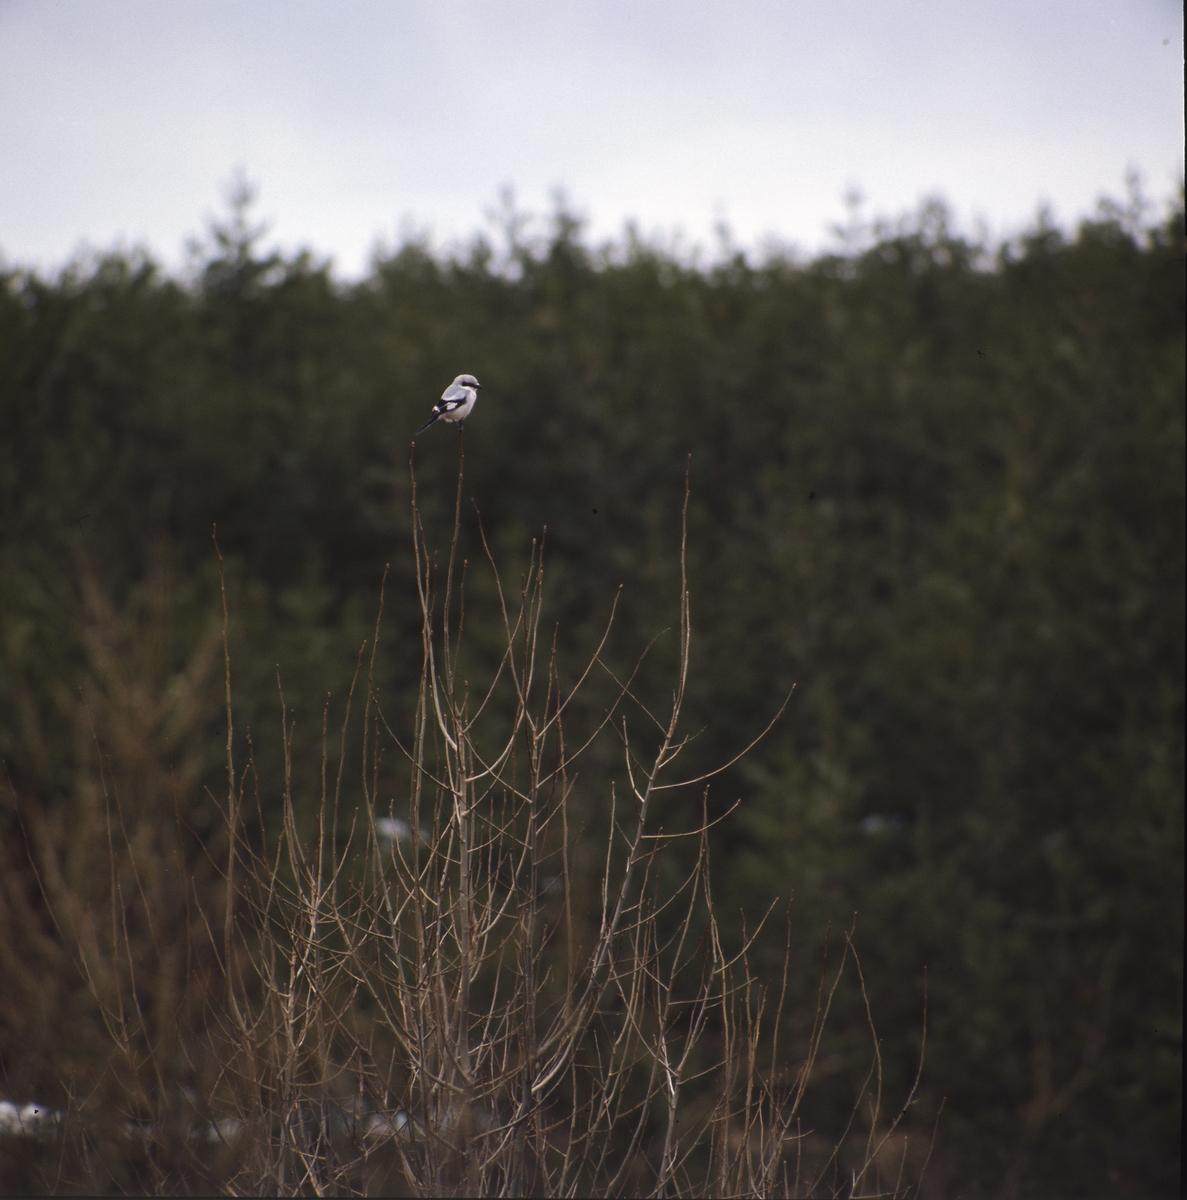 En varfågel sitter i toppen av en buske famför mörk barrskog.